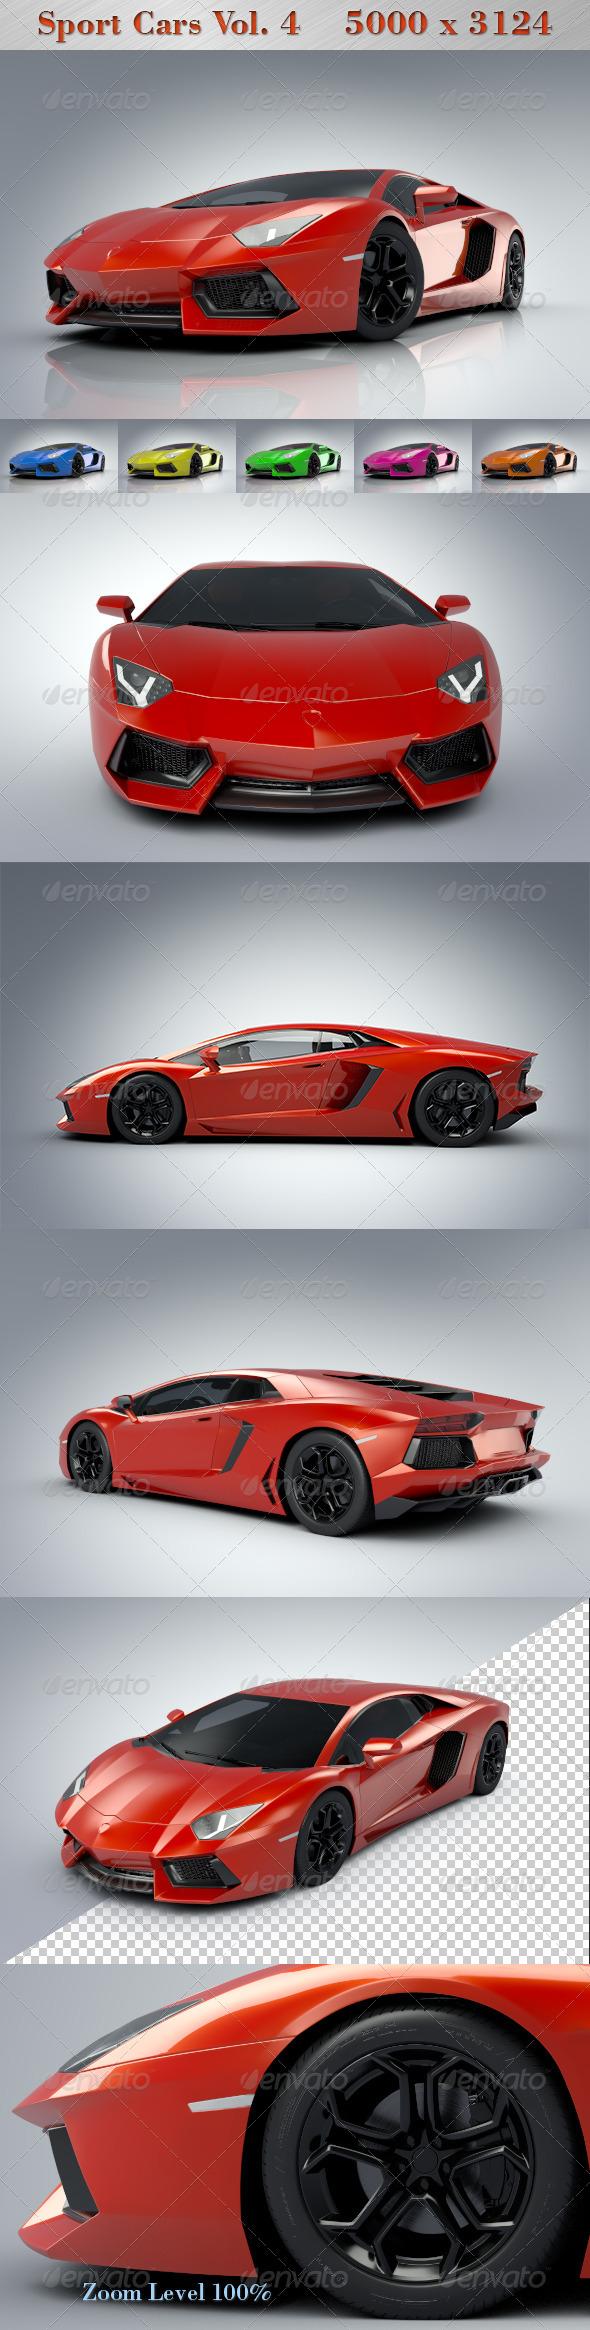 Sport Cars Vol.4 - 3D Backgrounds